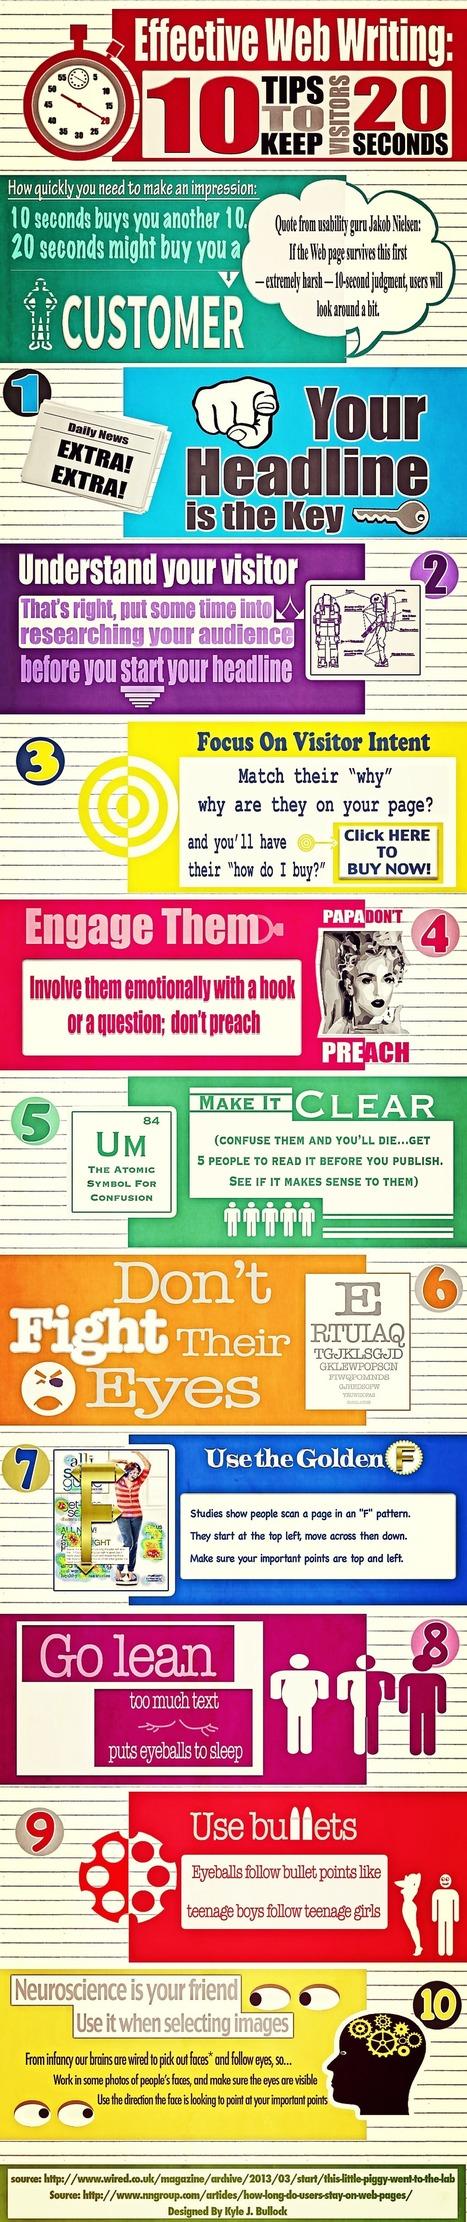 10 consejos para que las visitas a la web estén 20 segundos #infografia #infographic #marketing | Seo, Social Media Marketing | Scoop.it